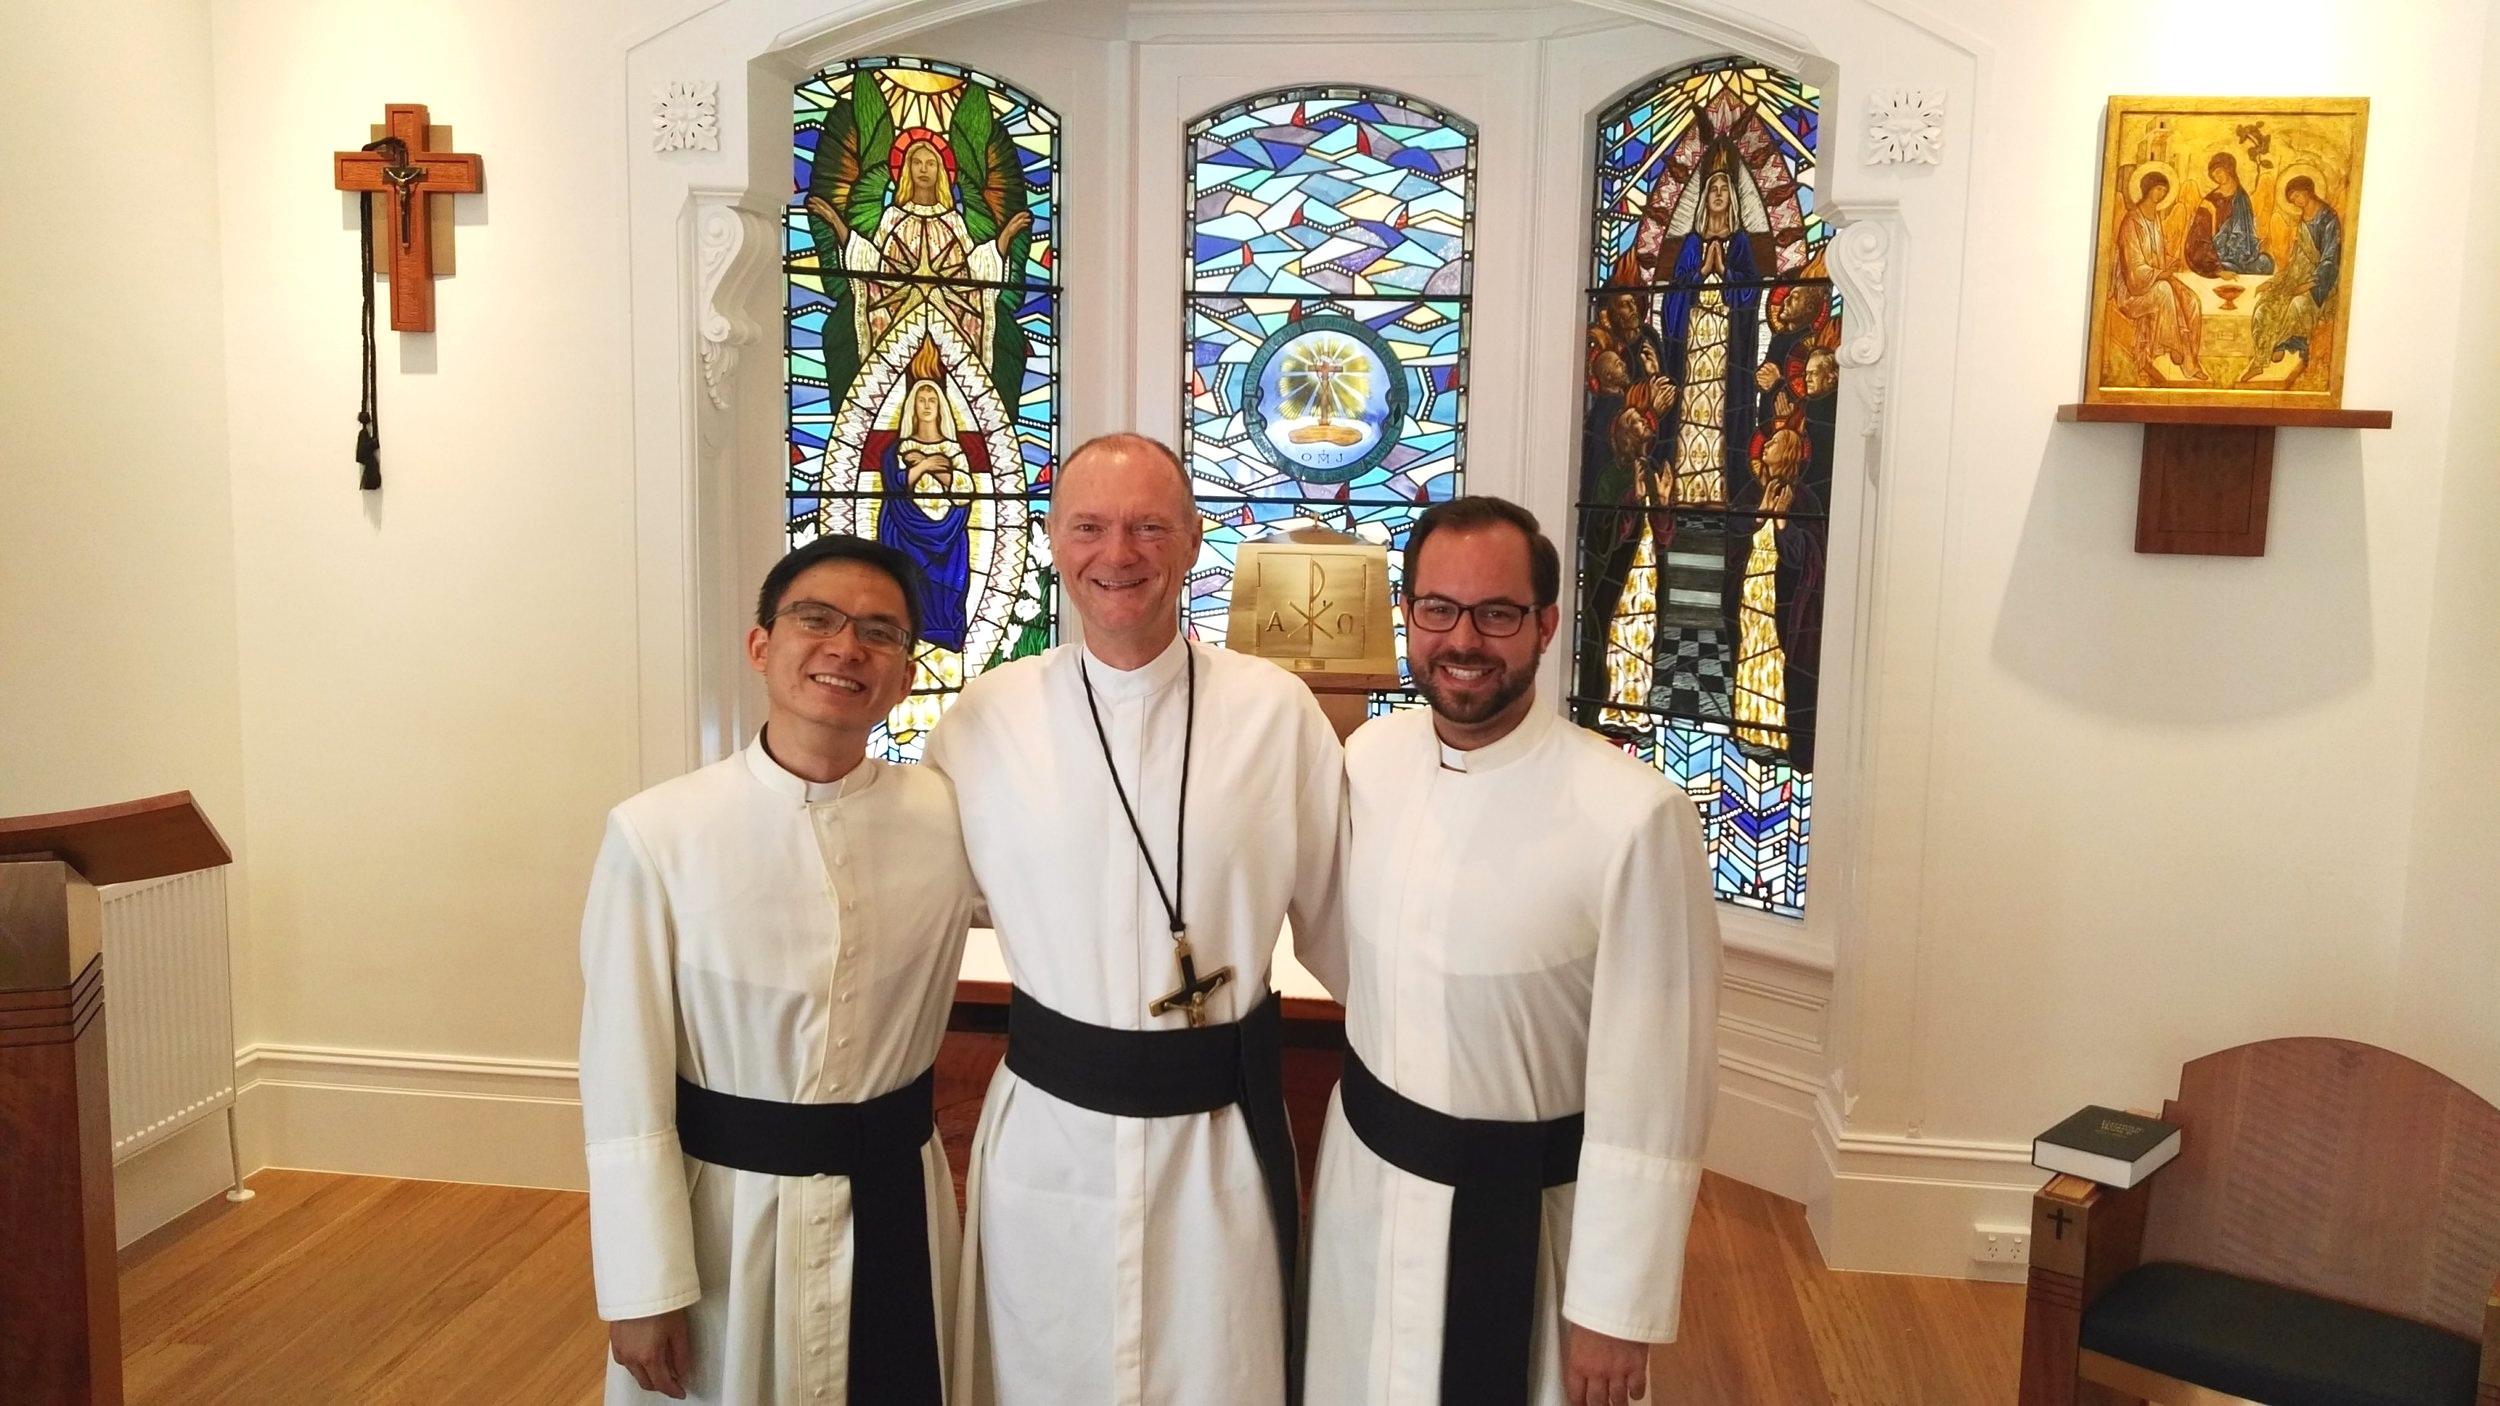 2019-02-17 - St Mary's Seminary - OMI Anniv & Renew Vows-01.jpg